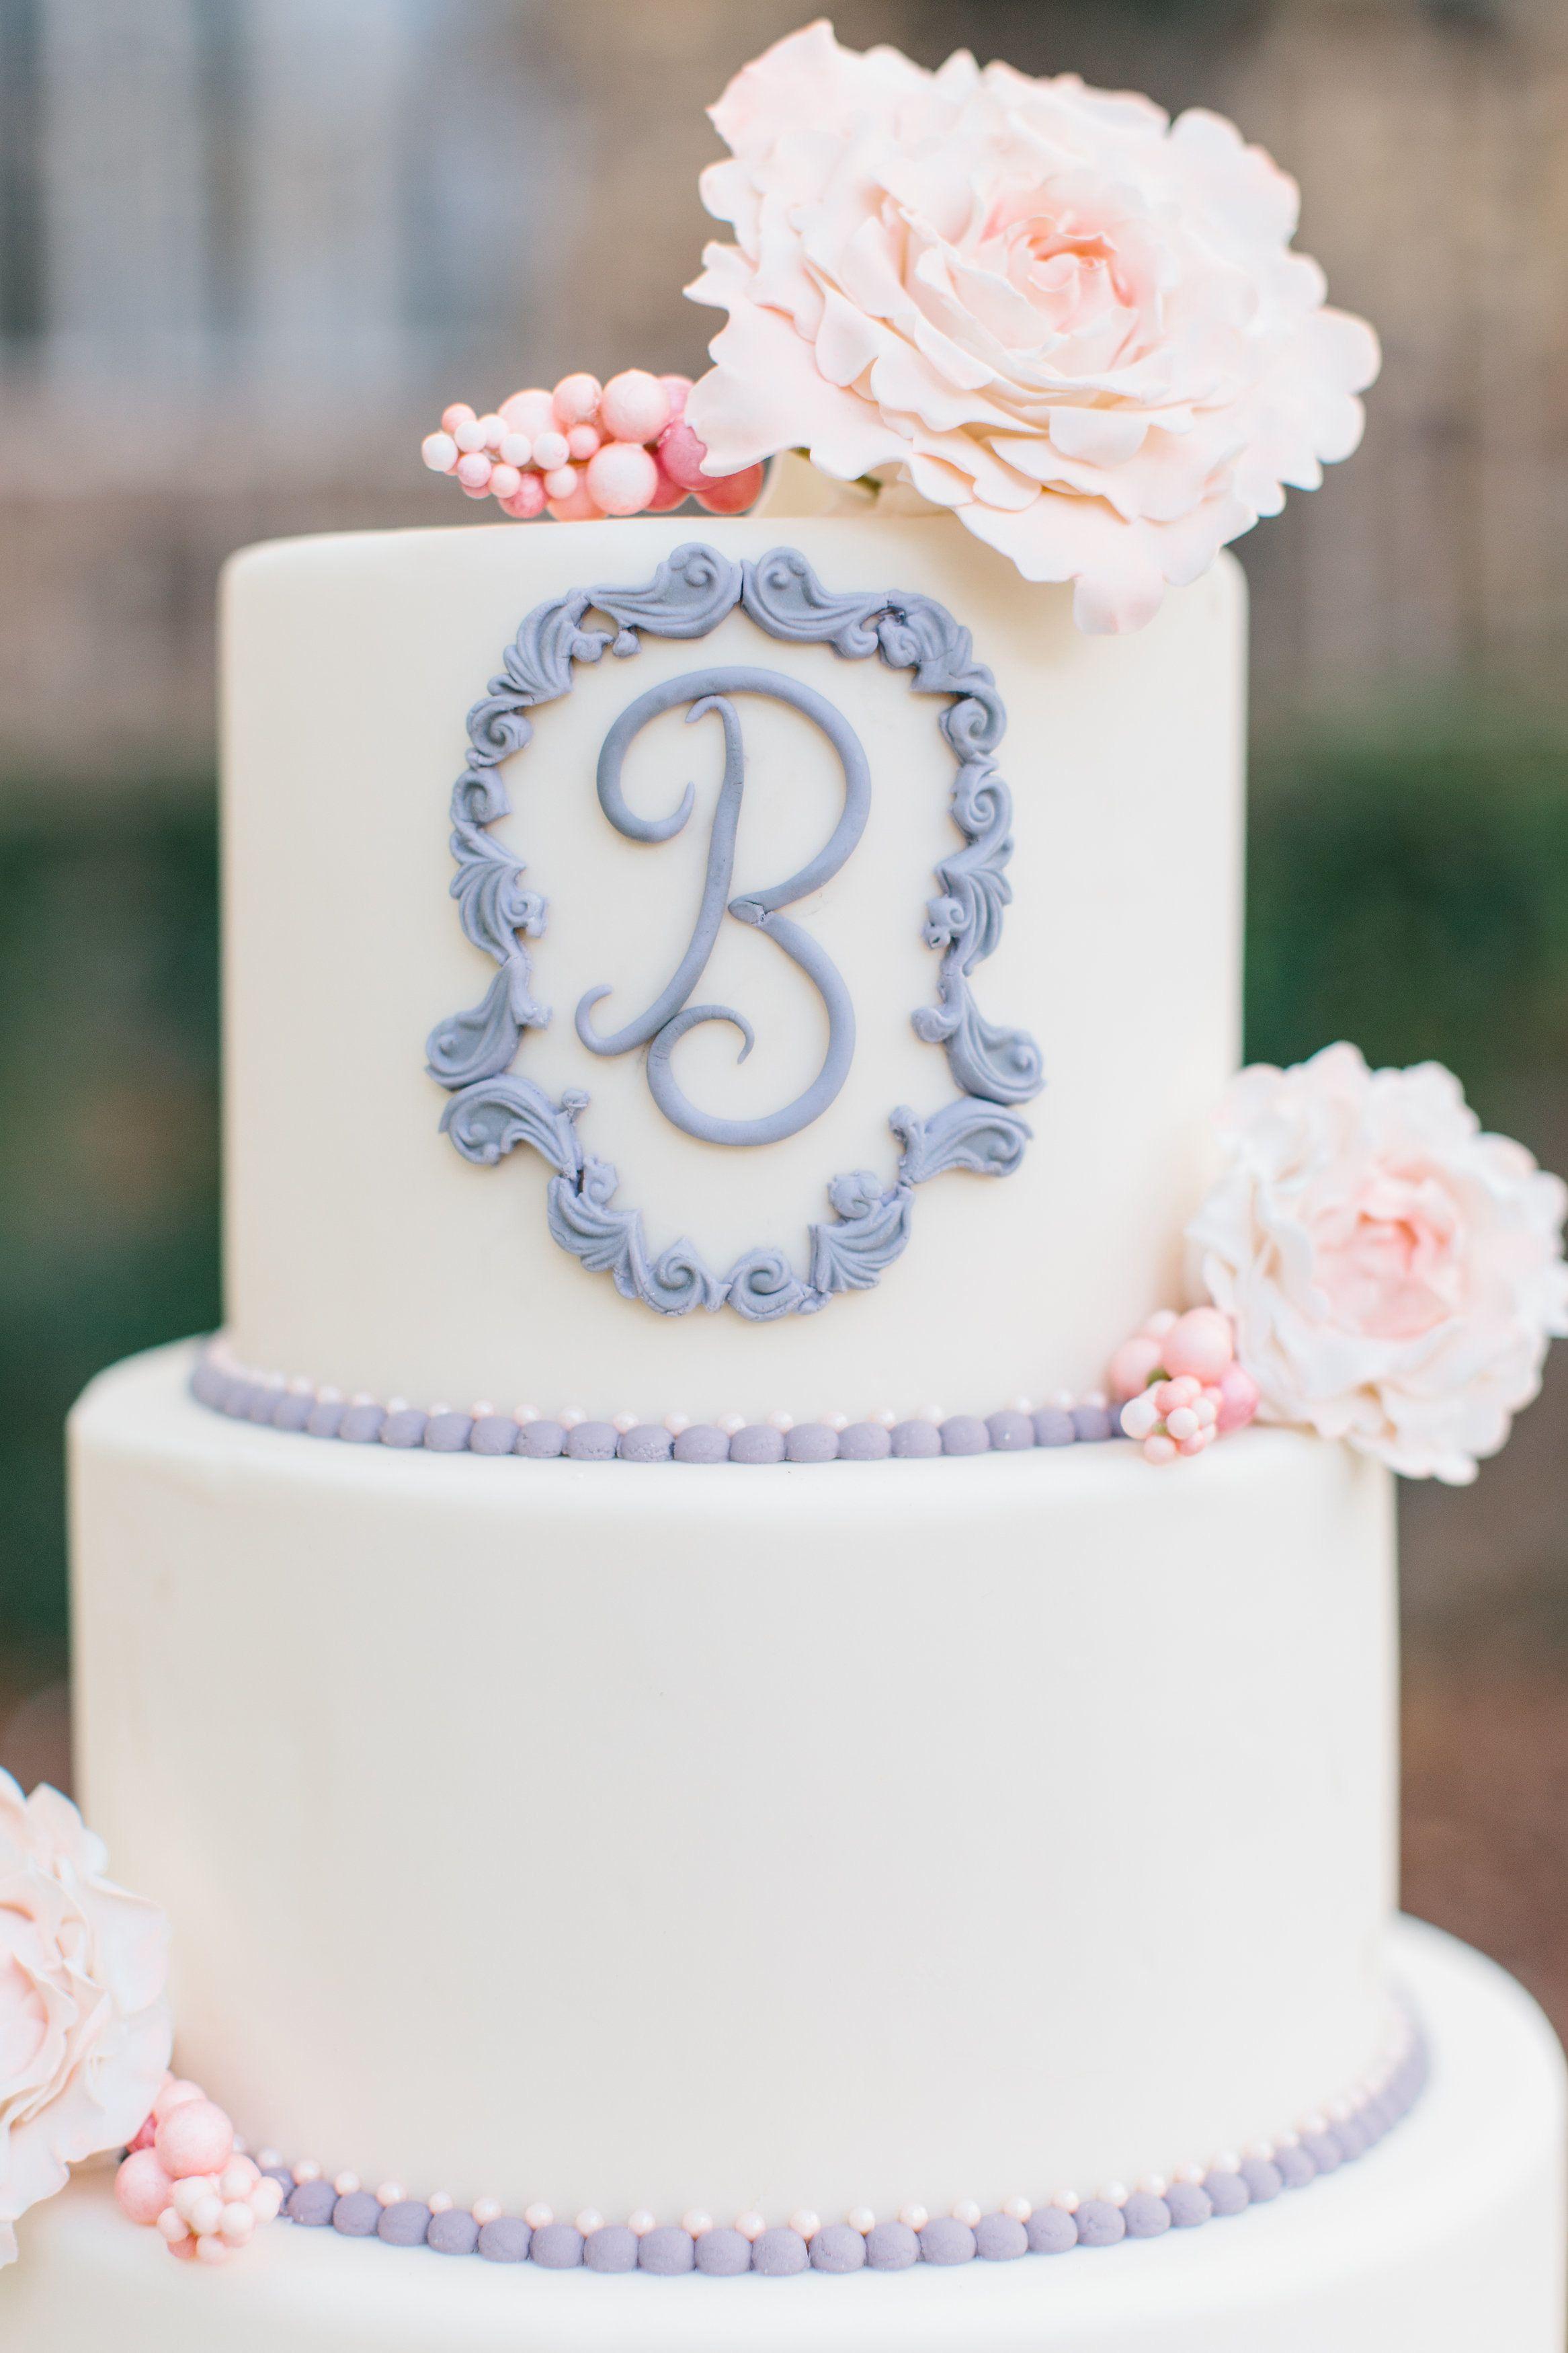 Elegant Downton Abbey Wedding Inspiration | Wed. | Pinterest ...